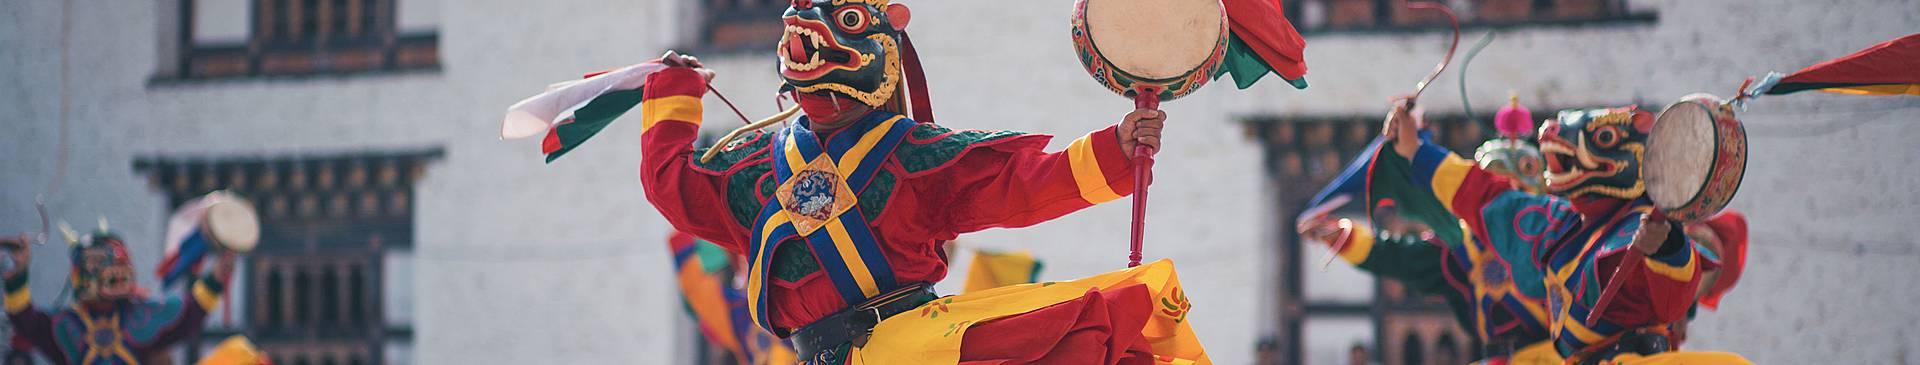 Two weeks in Bhutan